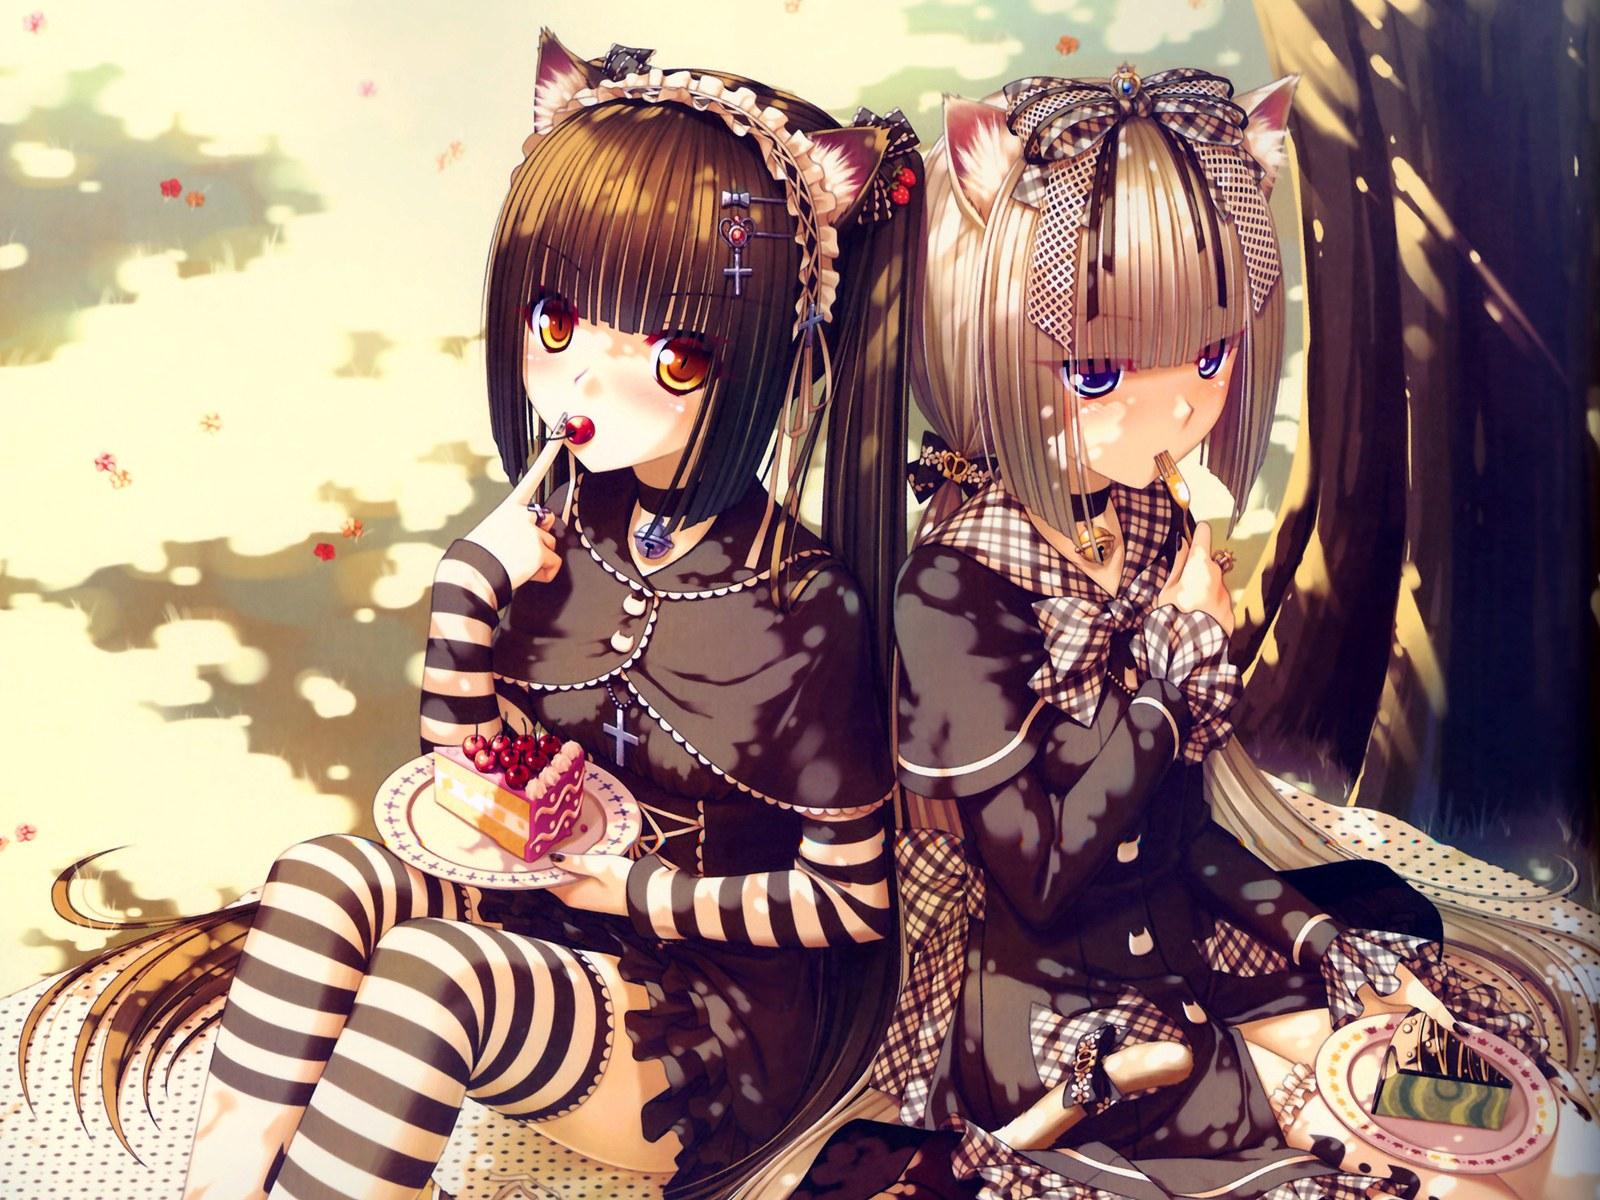 Cute anime girls hd wallpaper wallpapersafari - Anime pretty girl wallpaper ...